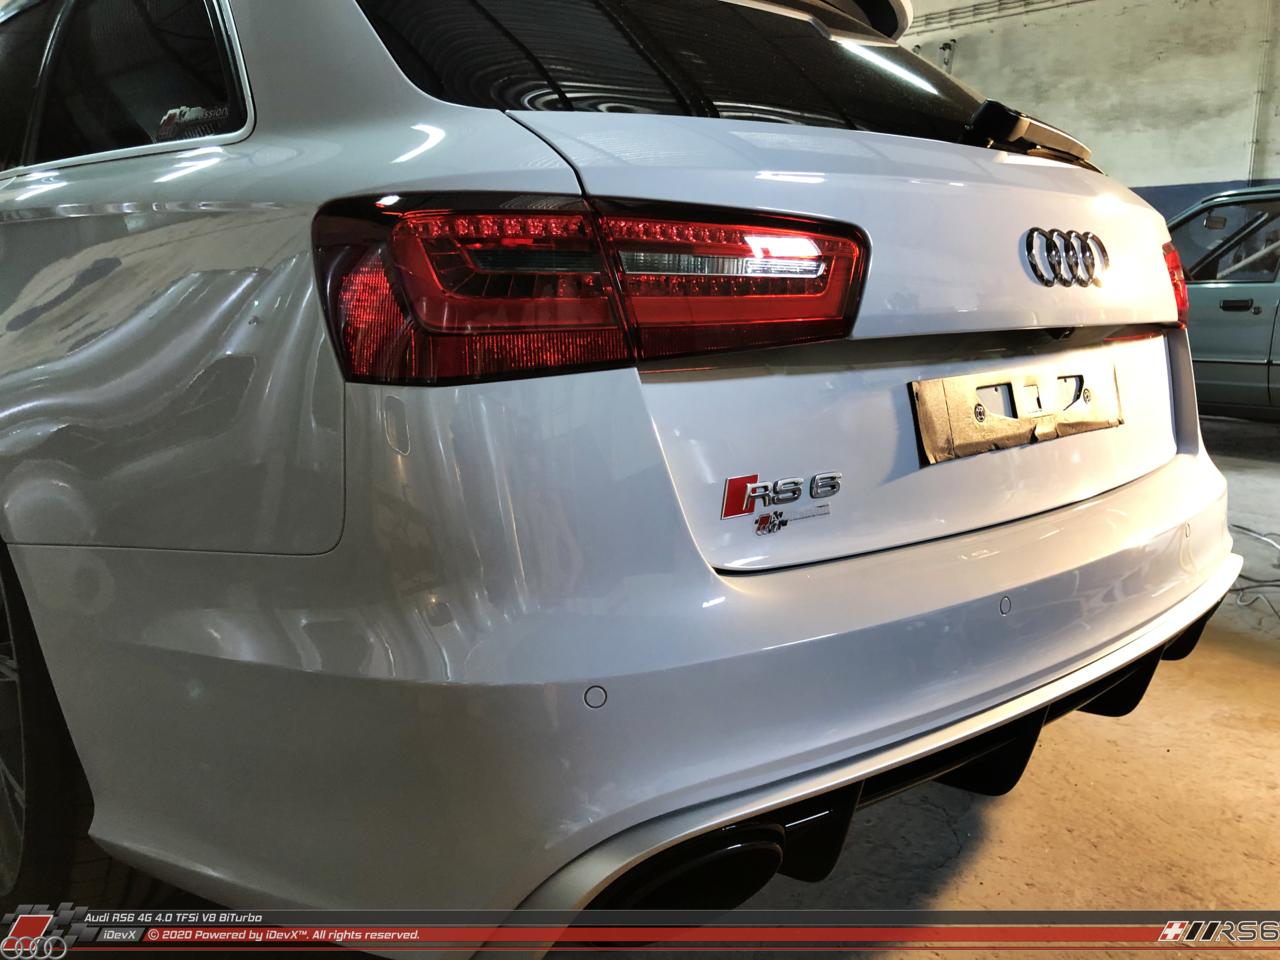 05_08.2019_Audi-RS6_iDevX_008.png